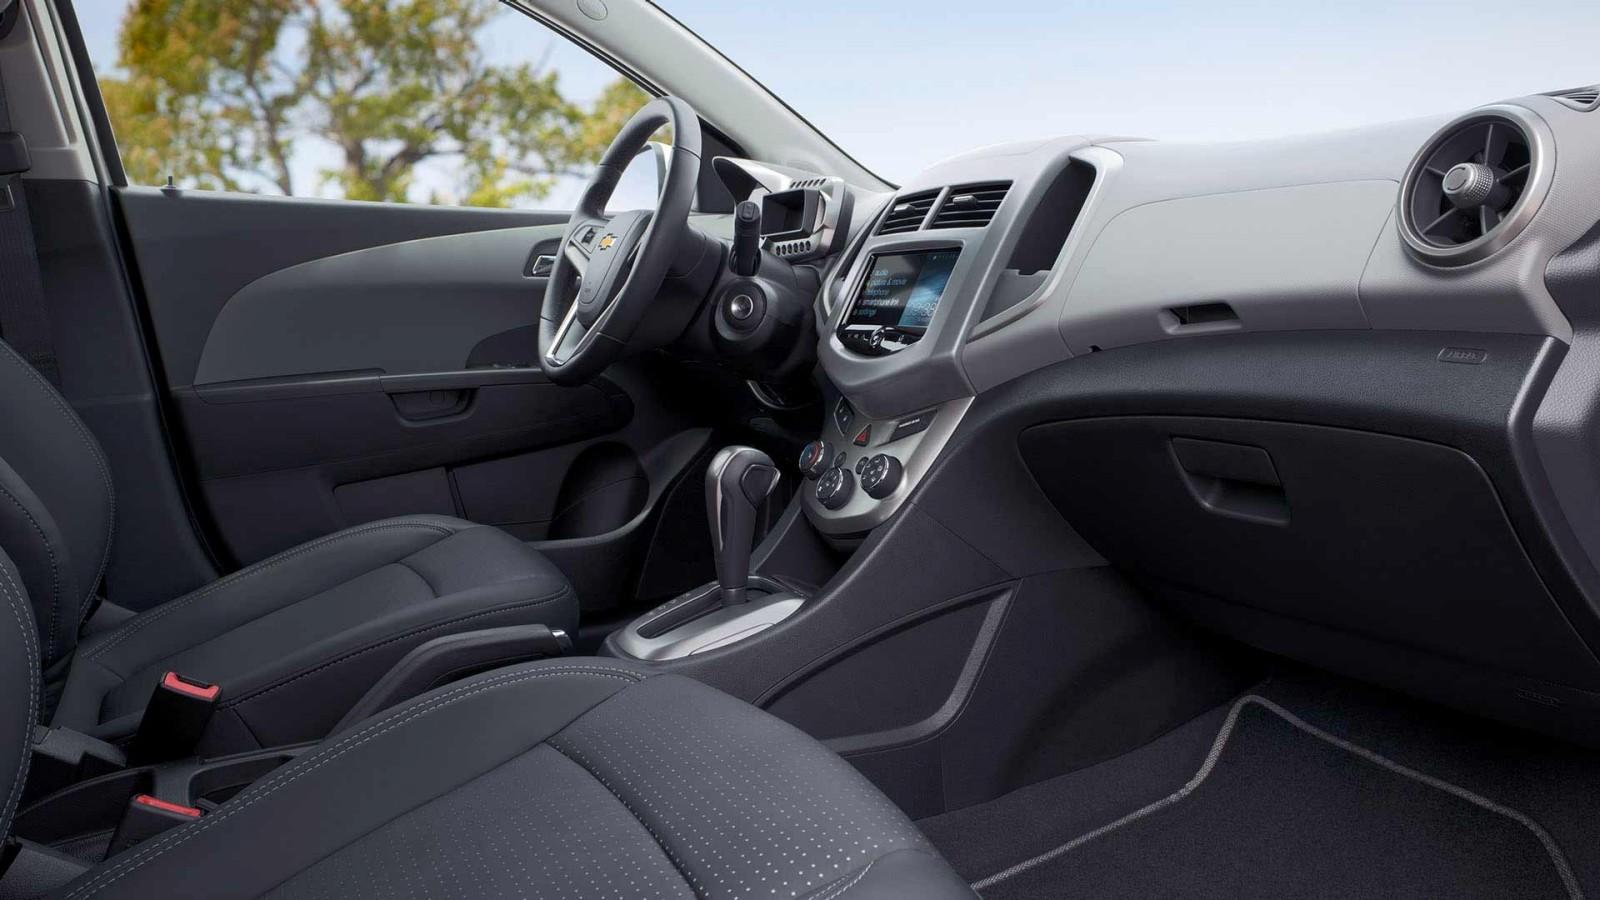 New Chevrolet Sonic Interior main image